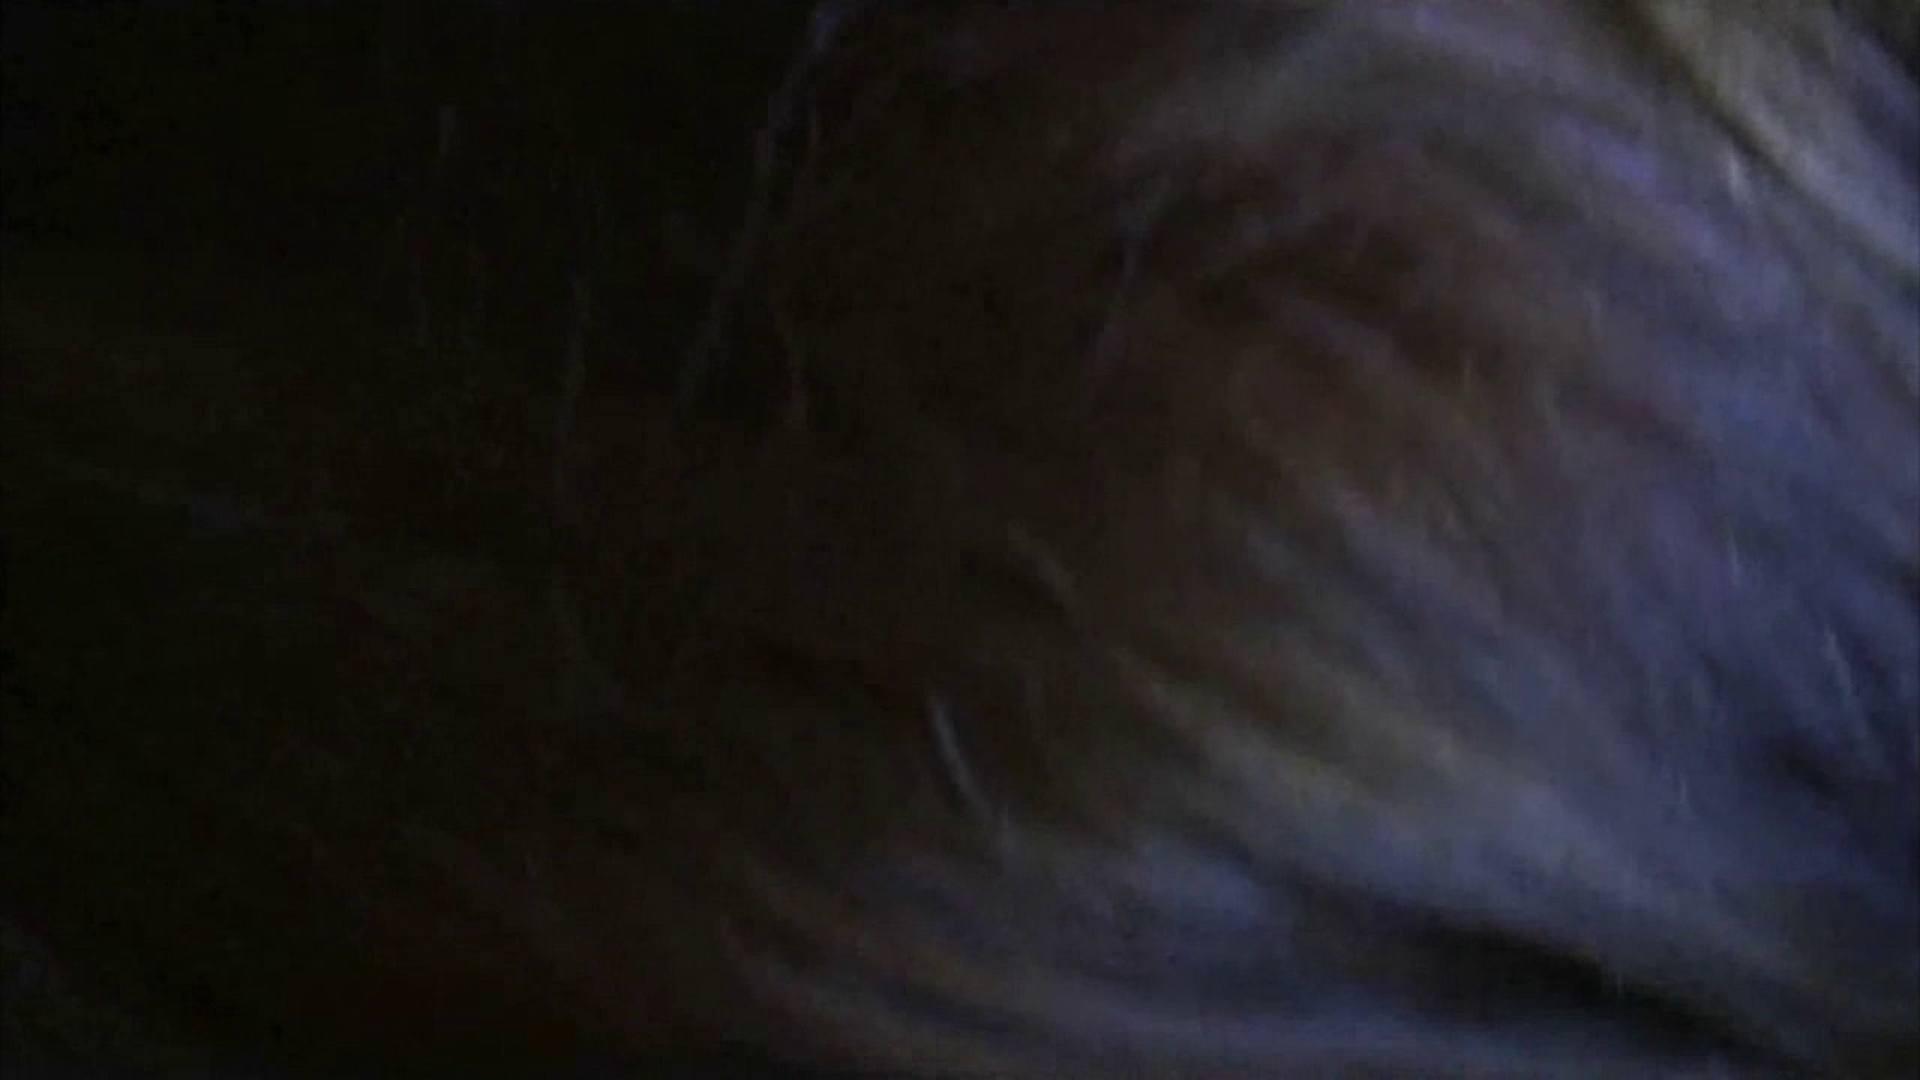 vol.5 ー前編ーユリナちゃんの身体を隅々まで観察しました。 ギャル攻め ぱこり動画紹介 89画像 52